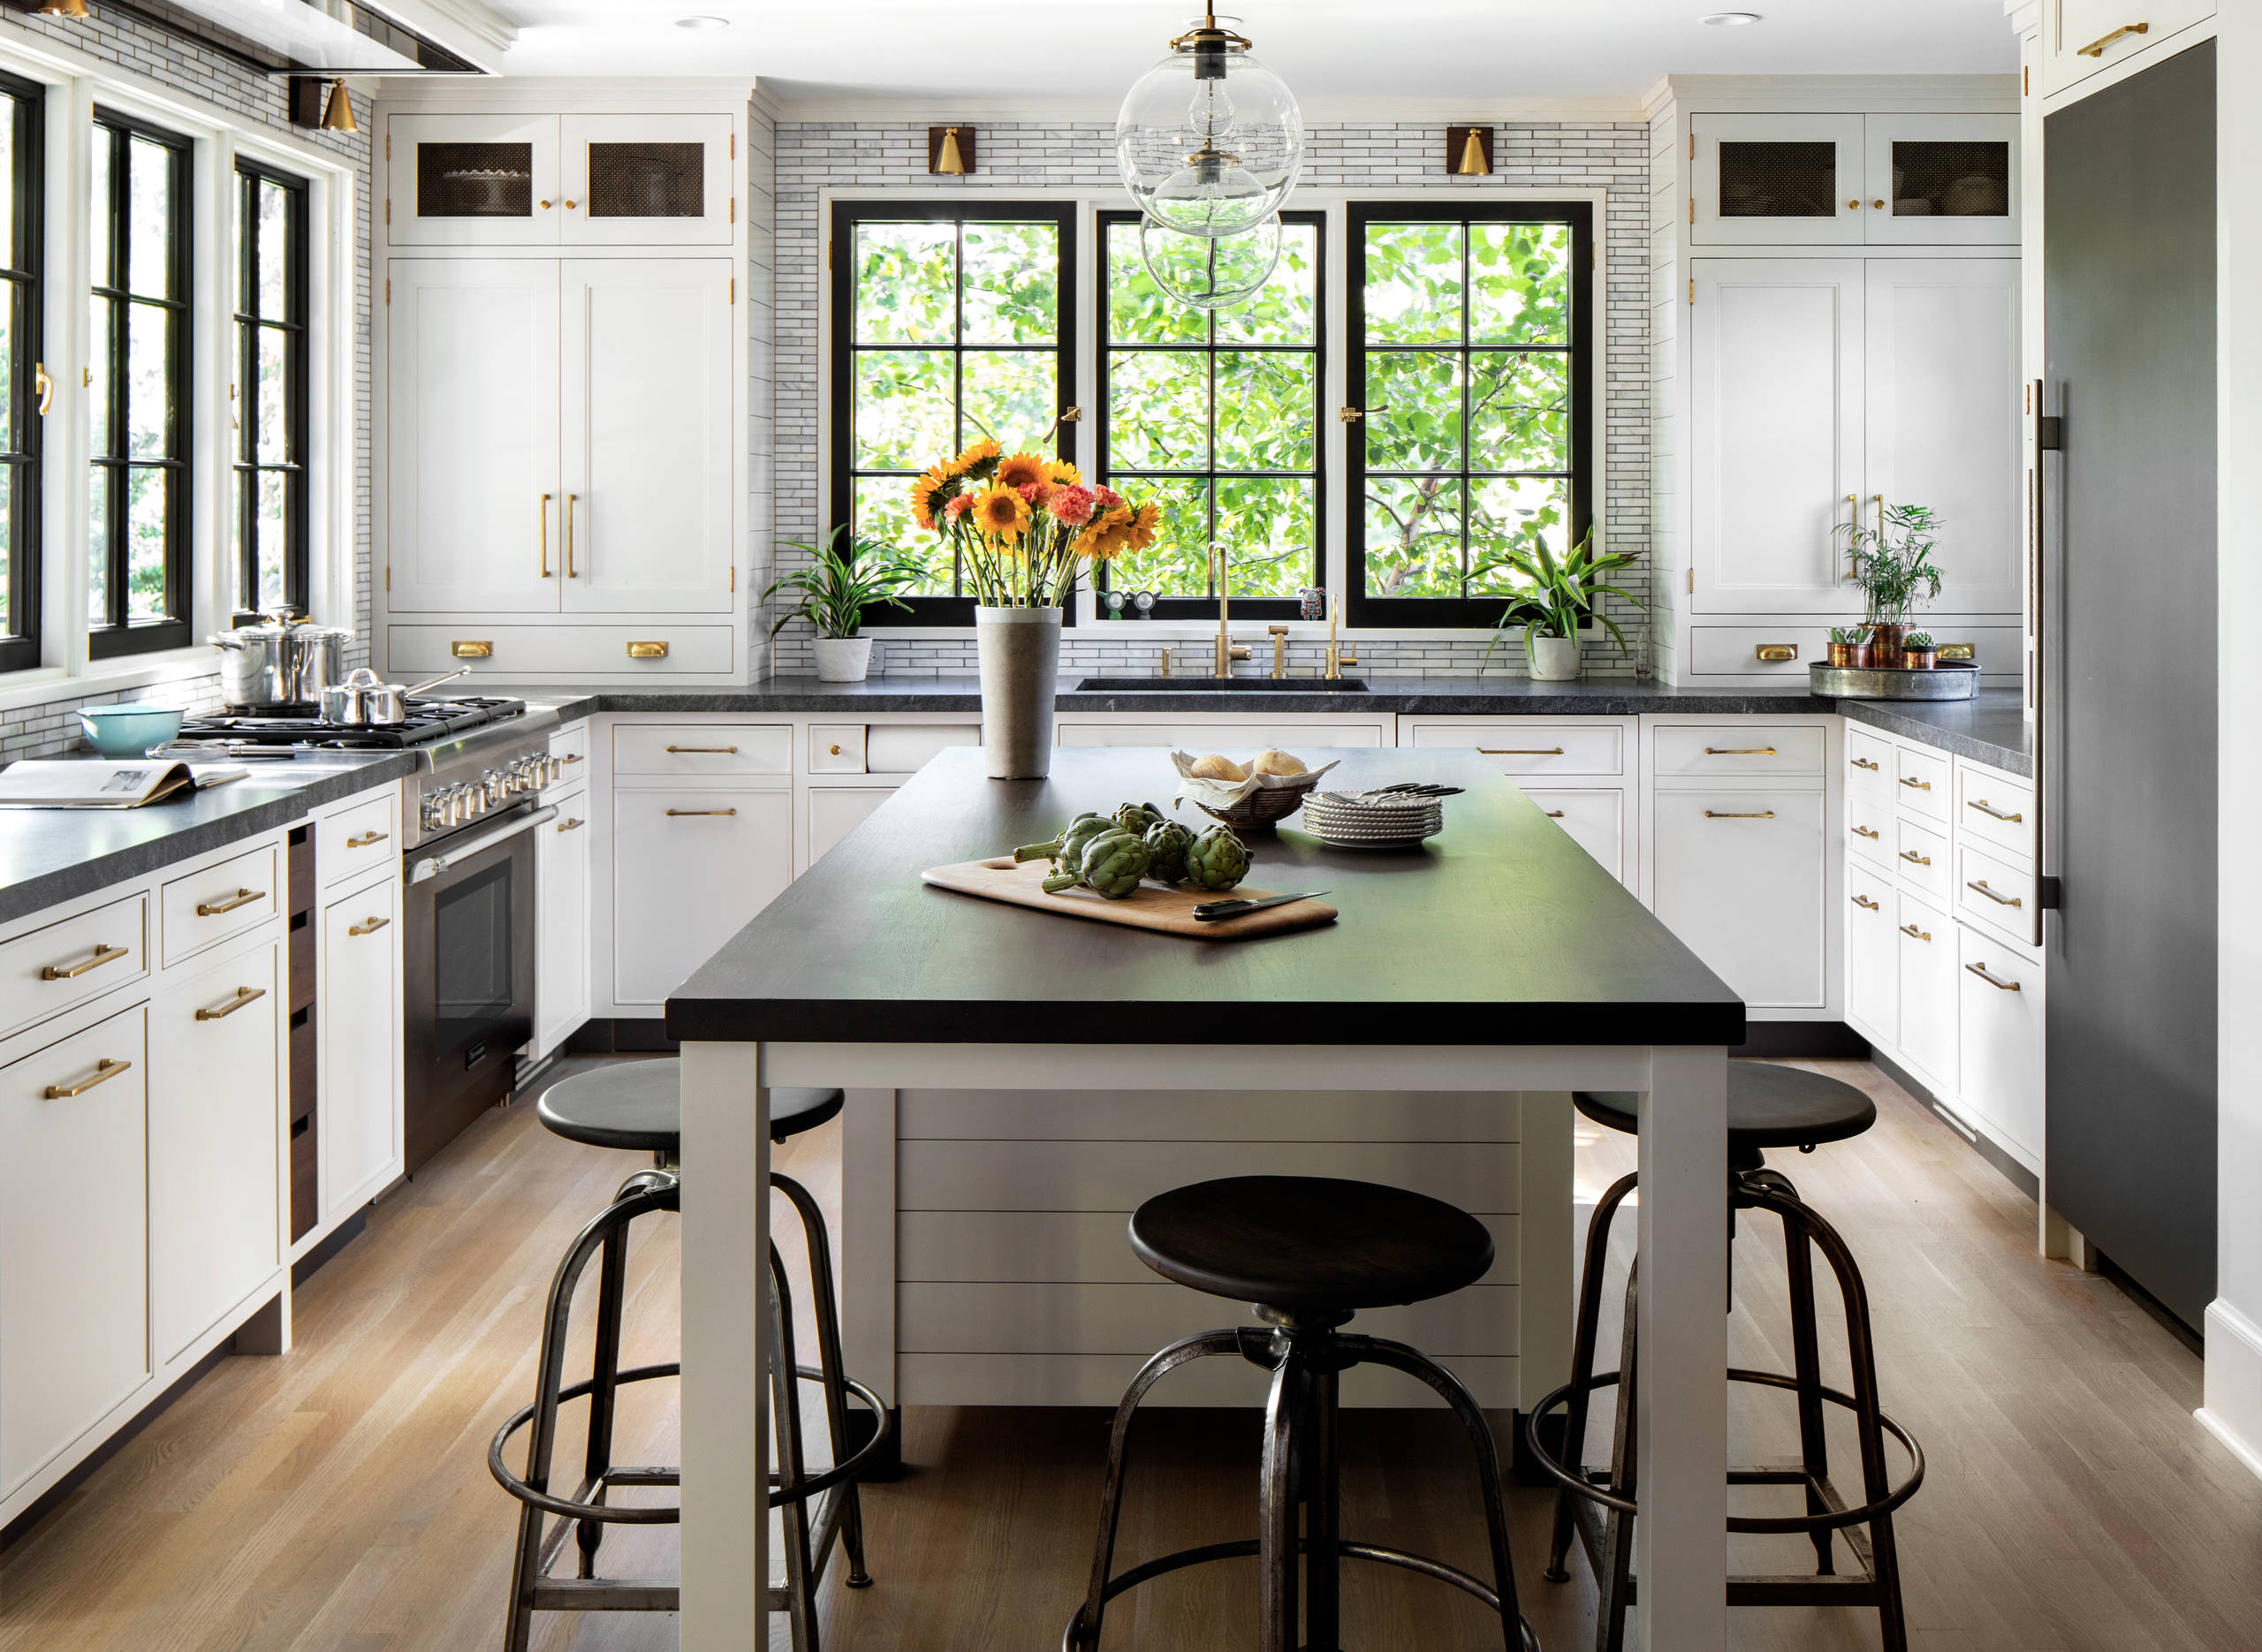 White cabinets black countertops Farmhouse Kitchen inset door cabinetry et mist countertop mosaic backsplash